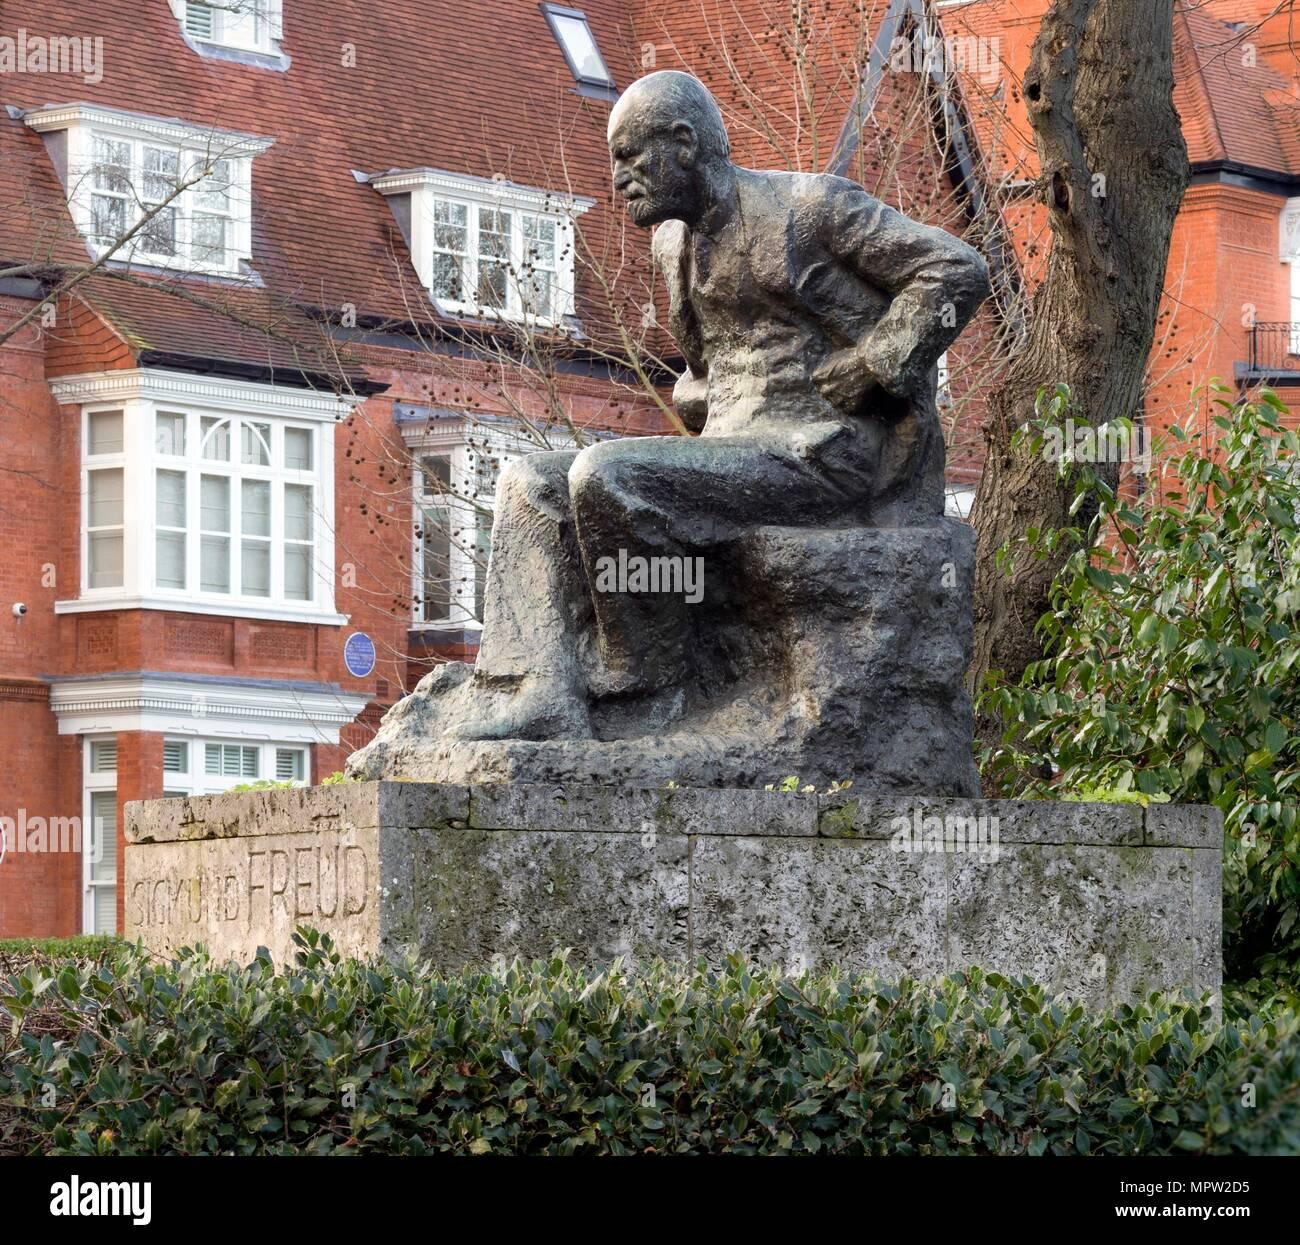 Statue of Sigmund Freud by Oscar Nemon, Swiss Cottage, Hampstead, London, 2016. Artist: Chris Redgrave. Stock Photo